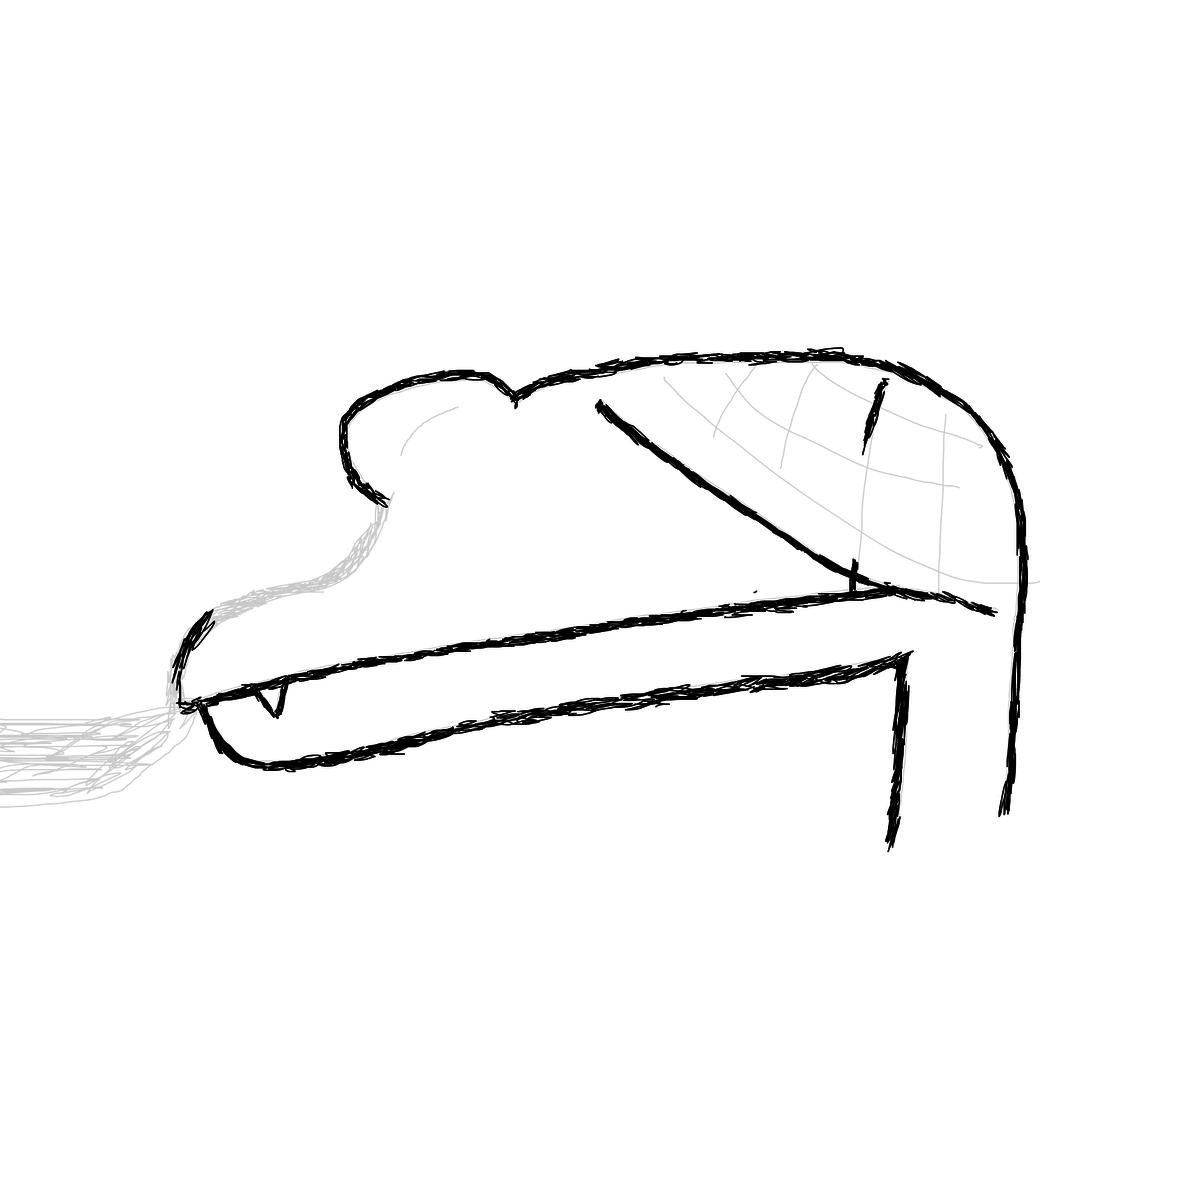 BAAAM drawing#23377 lat:46.5209388732910160lng: 6.6340503692626950